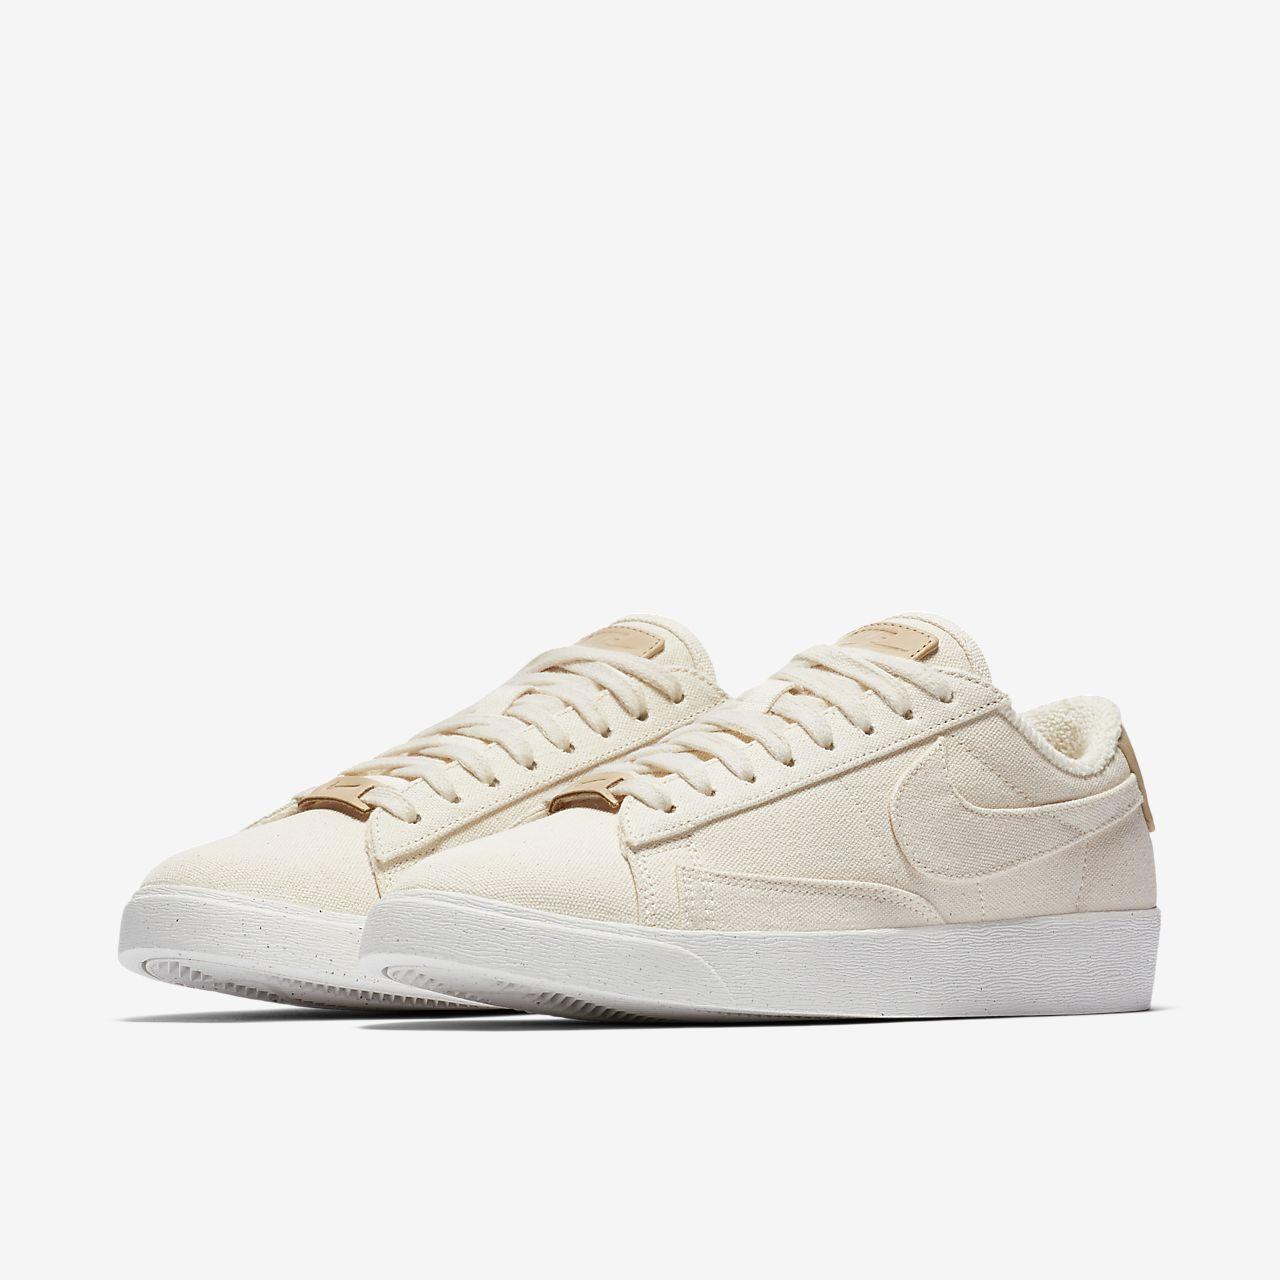 b2a9e53741 Nike Blazer Low LX Women's Shoe. Nike.com